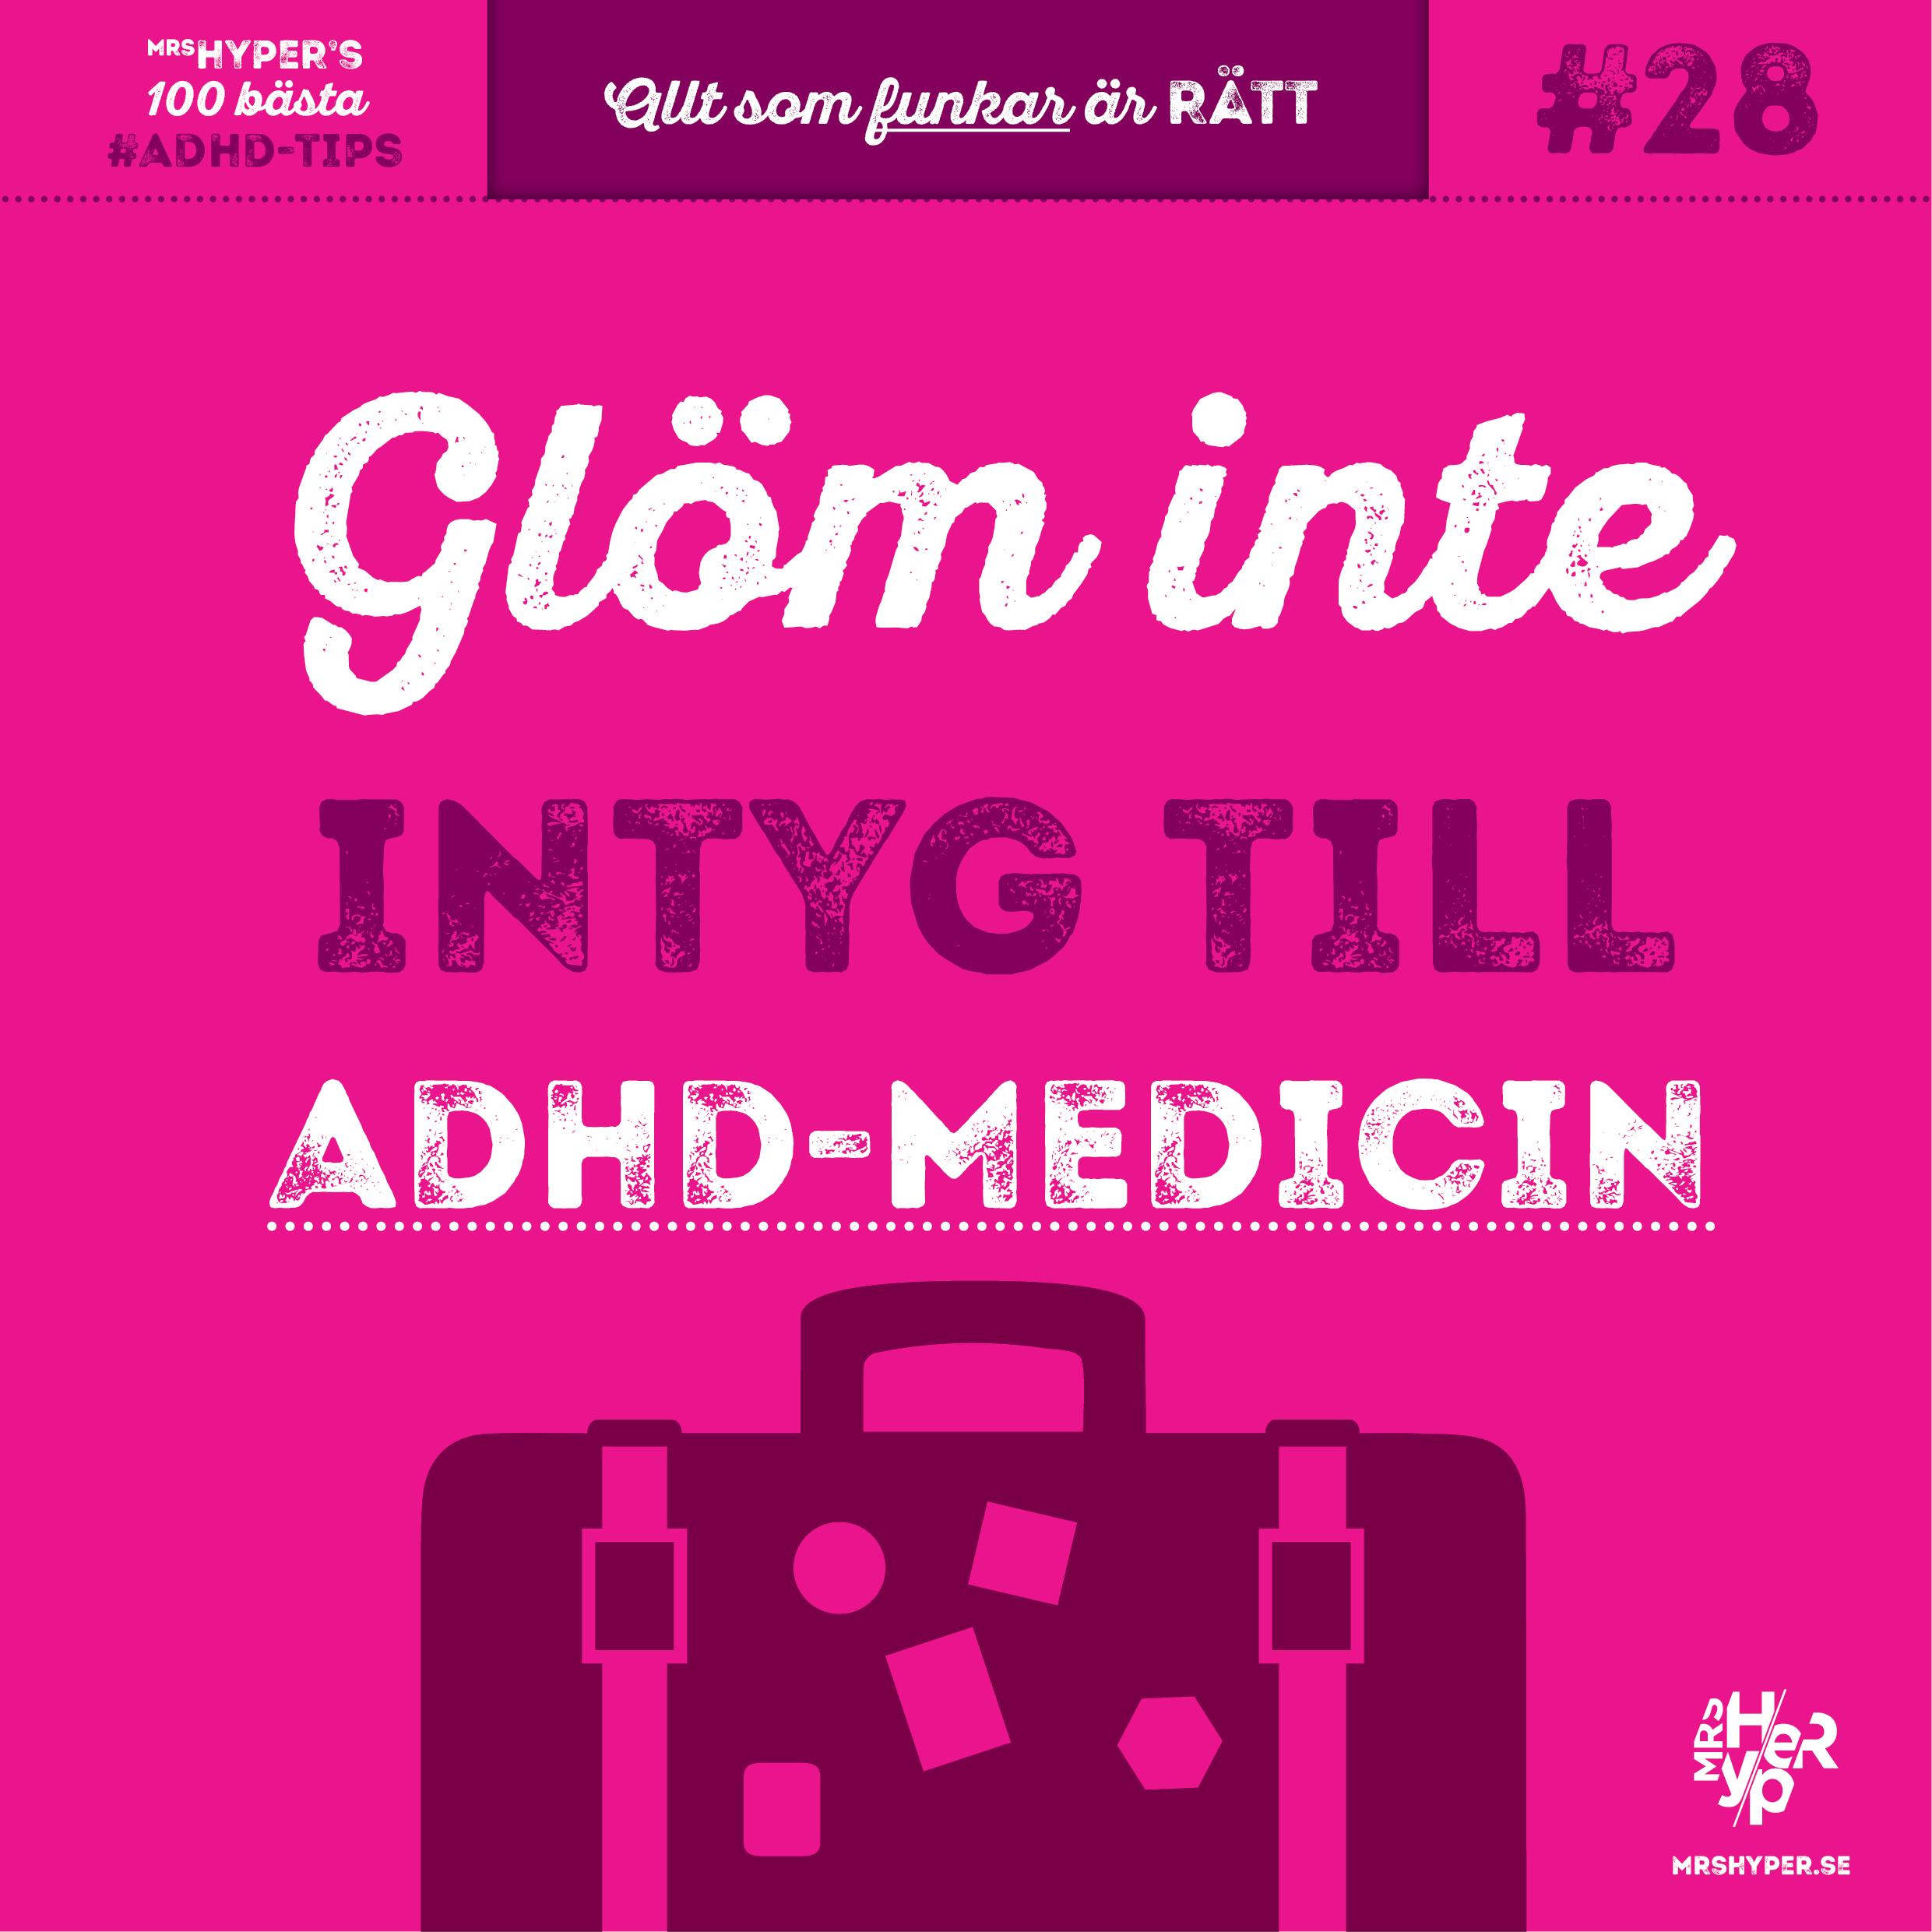 ADHD-tips #28. Resa med adhd-medicin